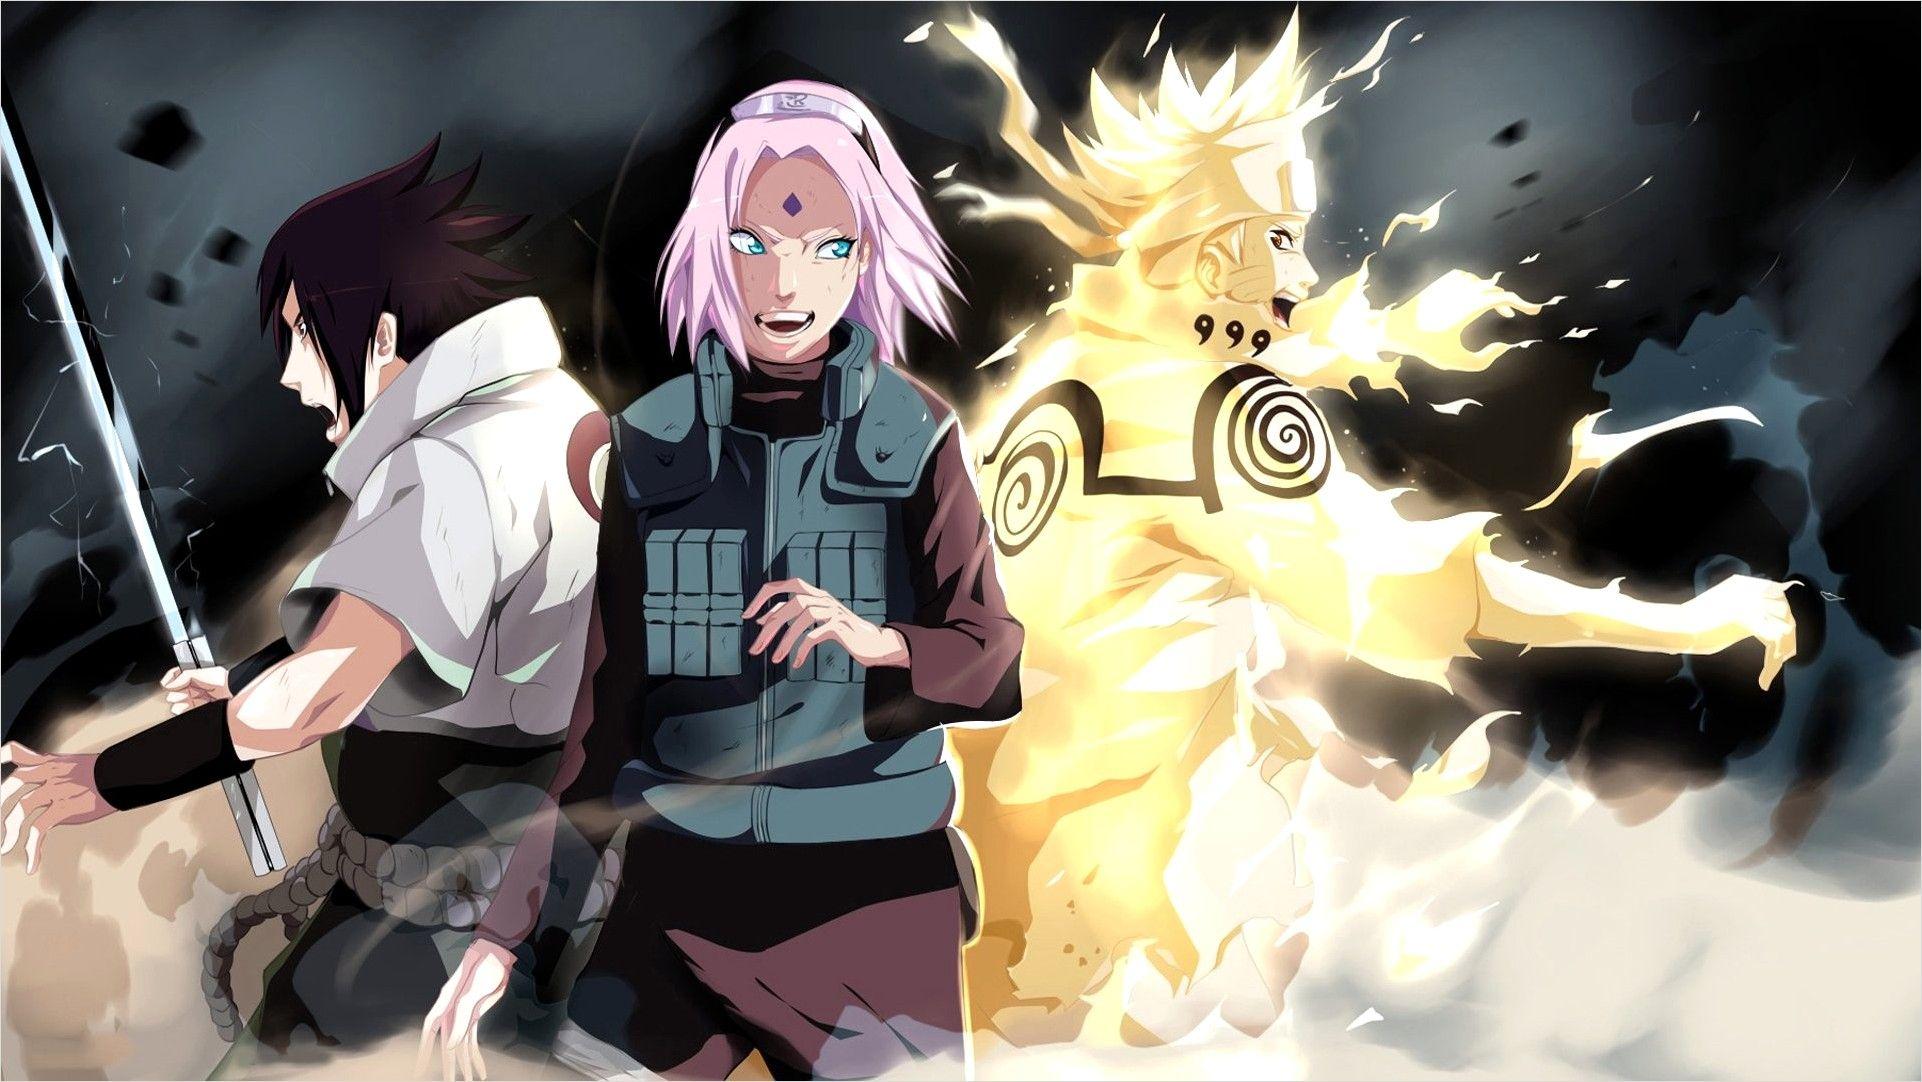 4k Naruto And Sasuke Adult Wallpaper In 2020 Naruto Sasuke